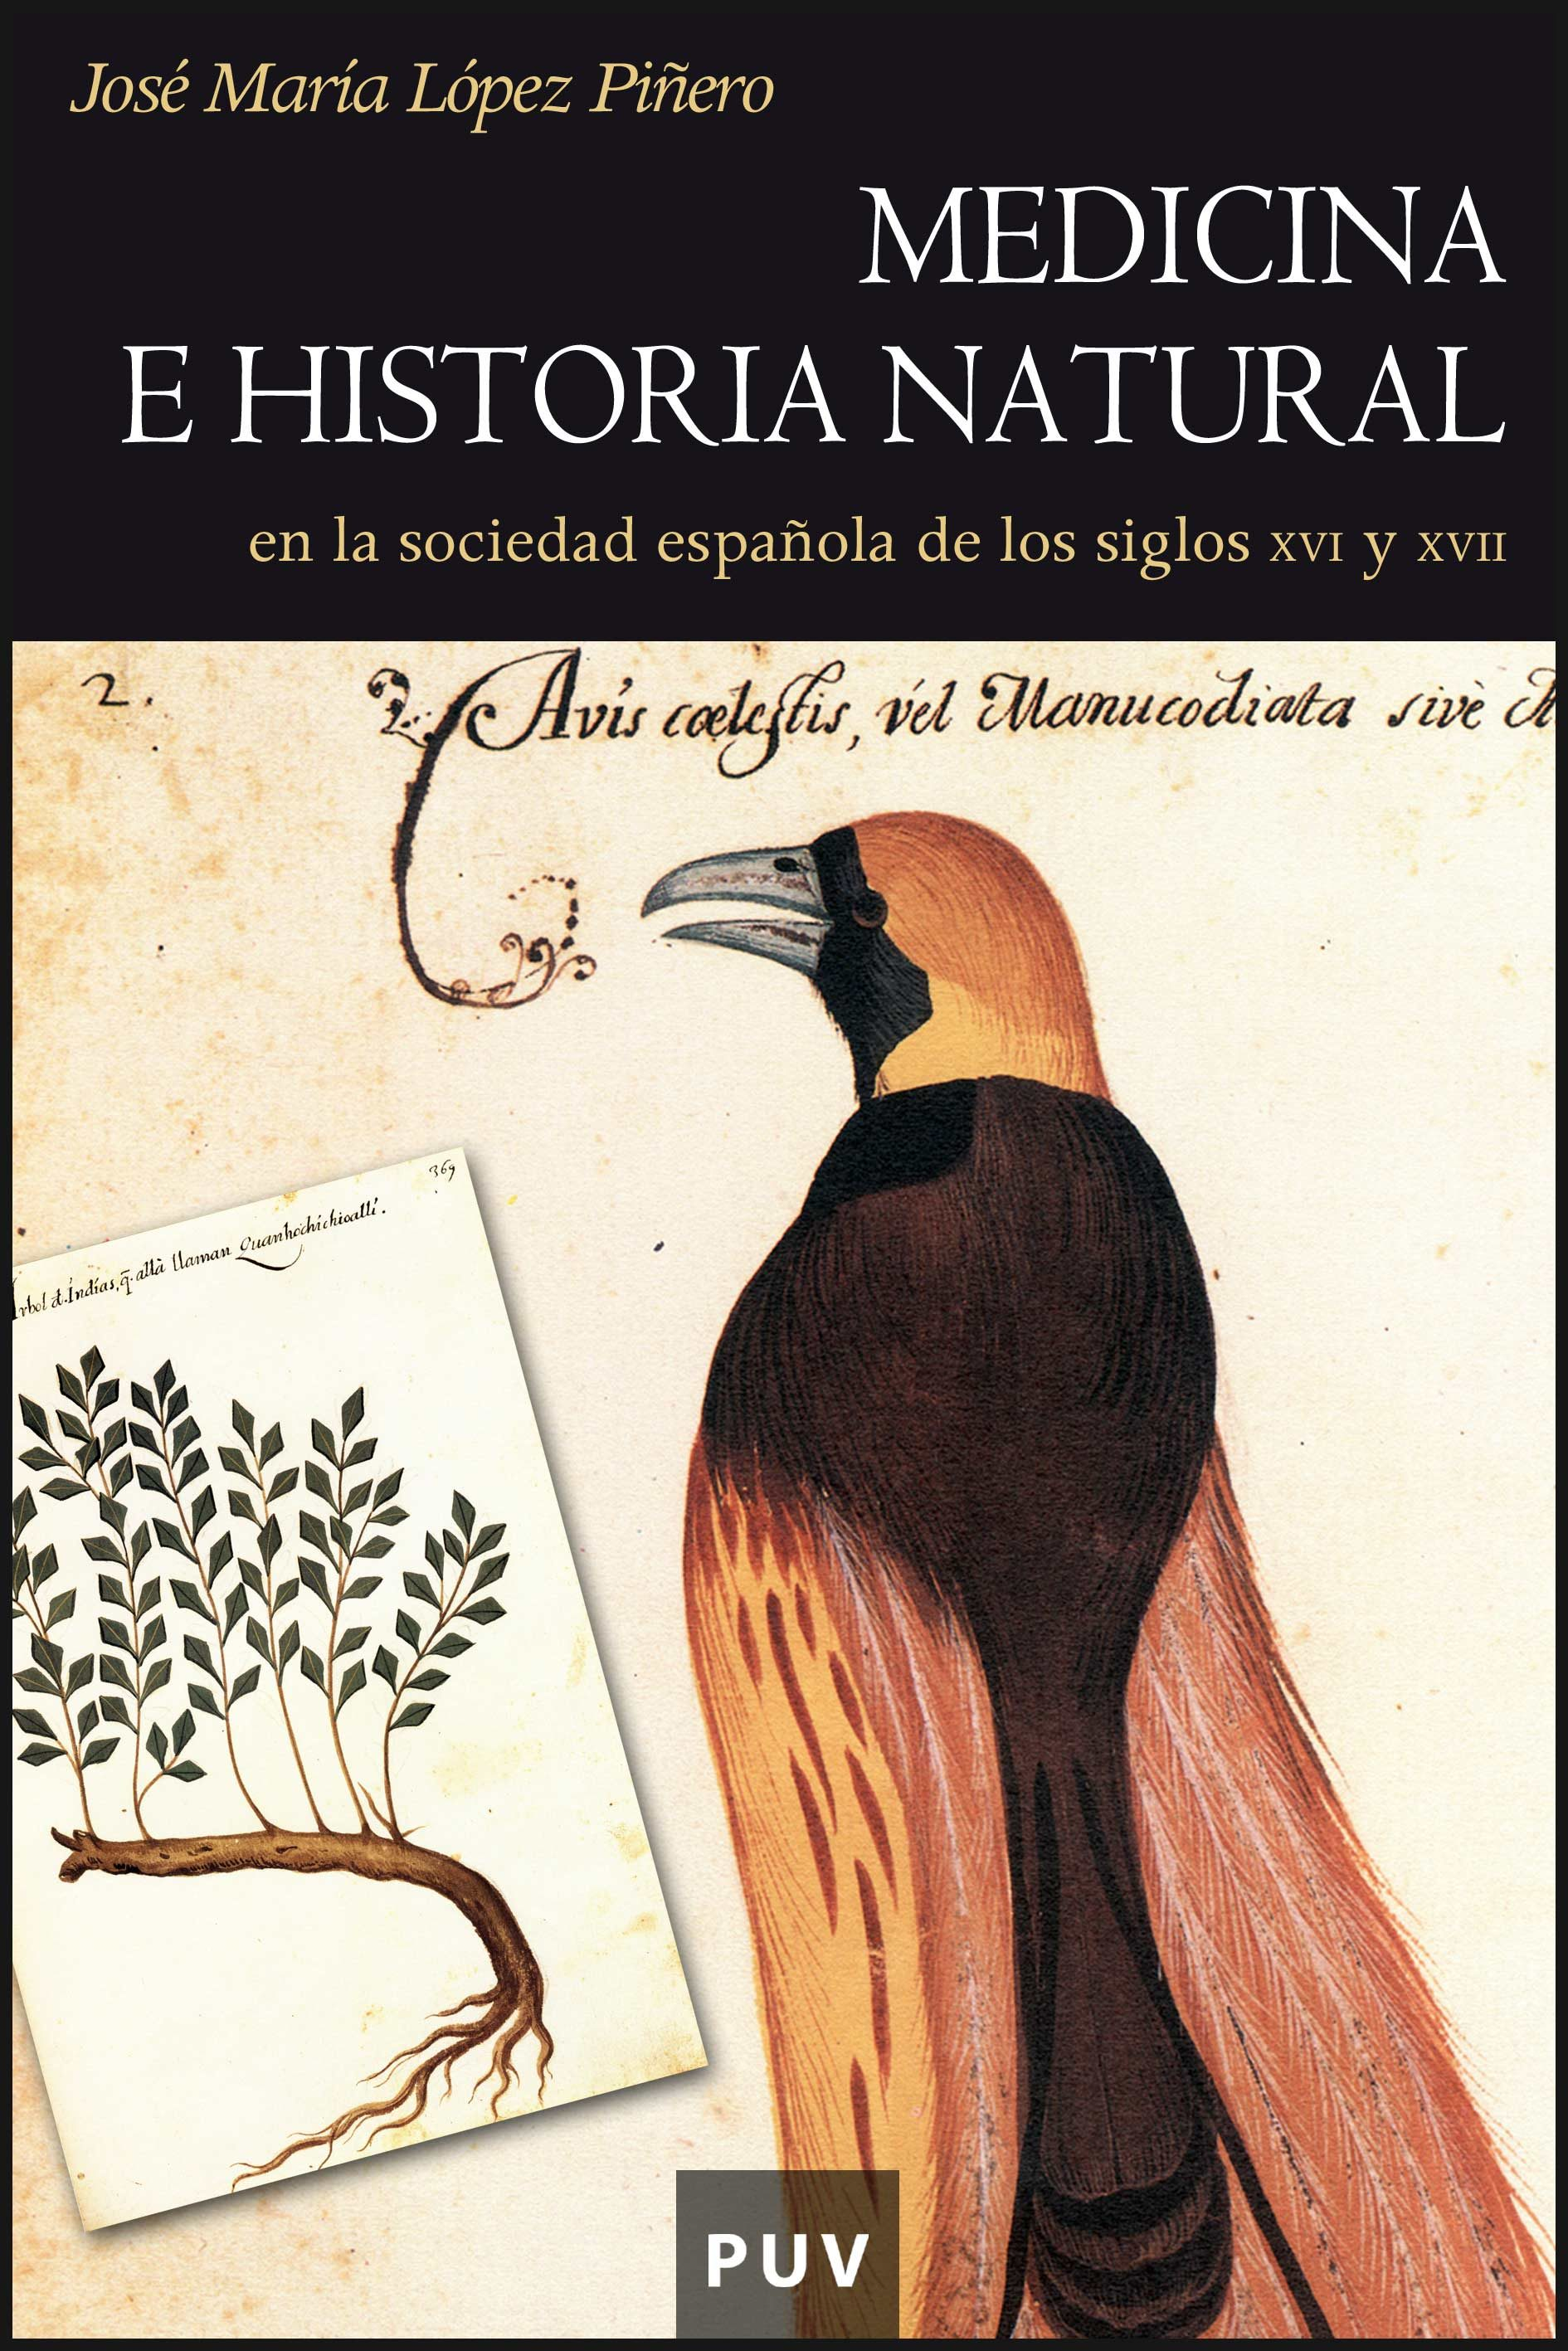 Medicina E Historia Natural En Sociedad Española Siglo Xvi-xvii por Jose Maria Lopez Piñero